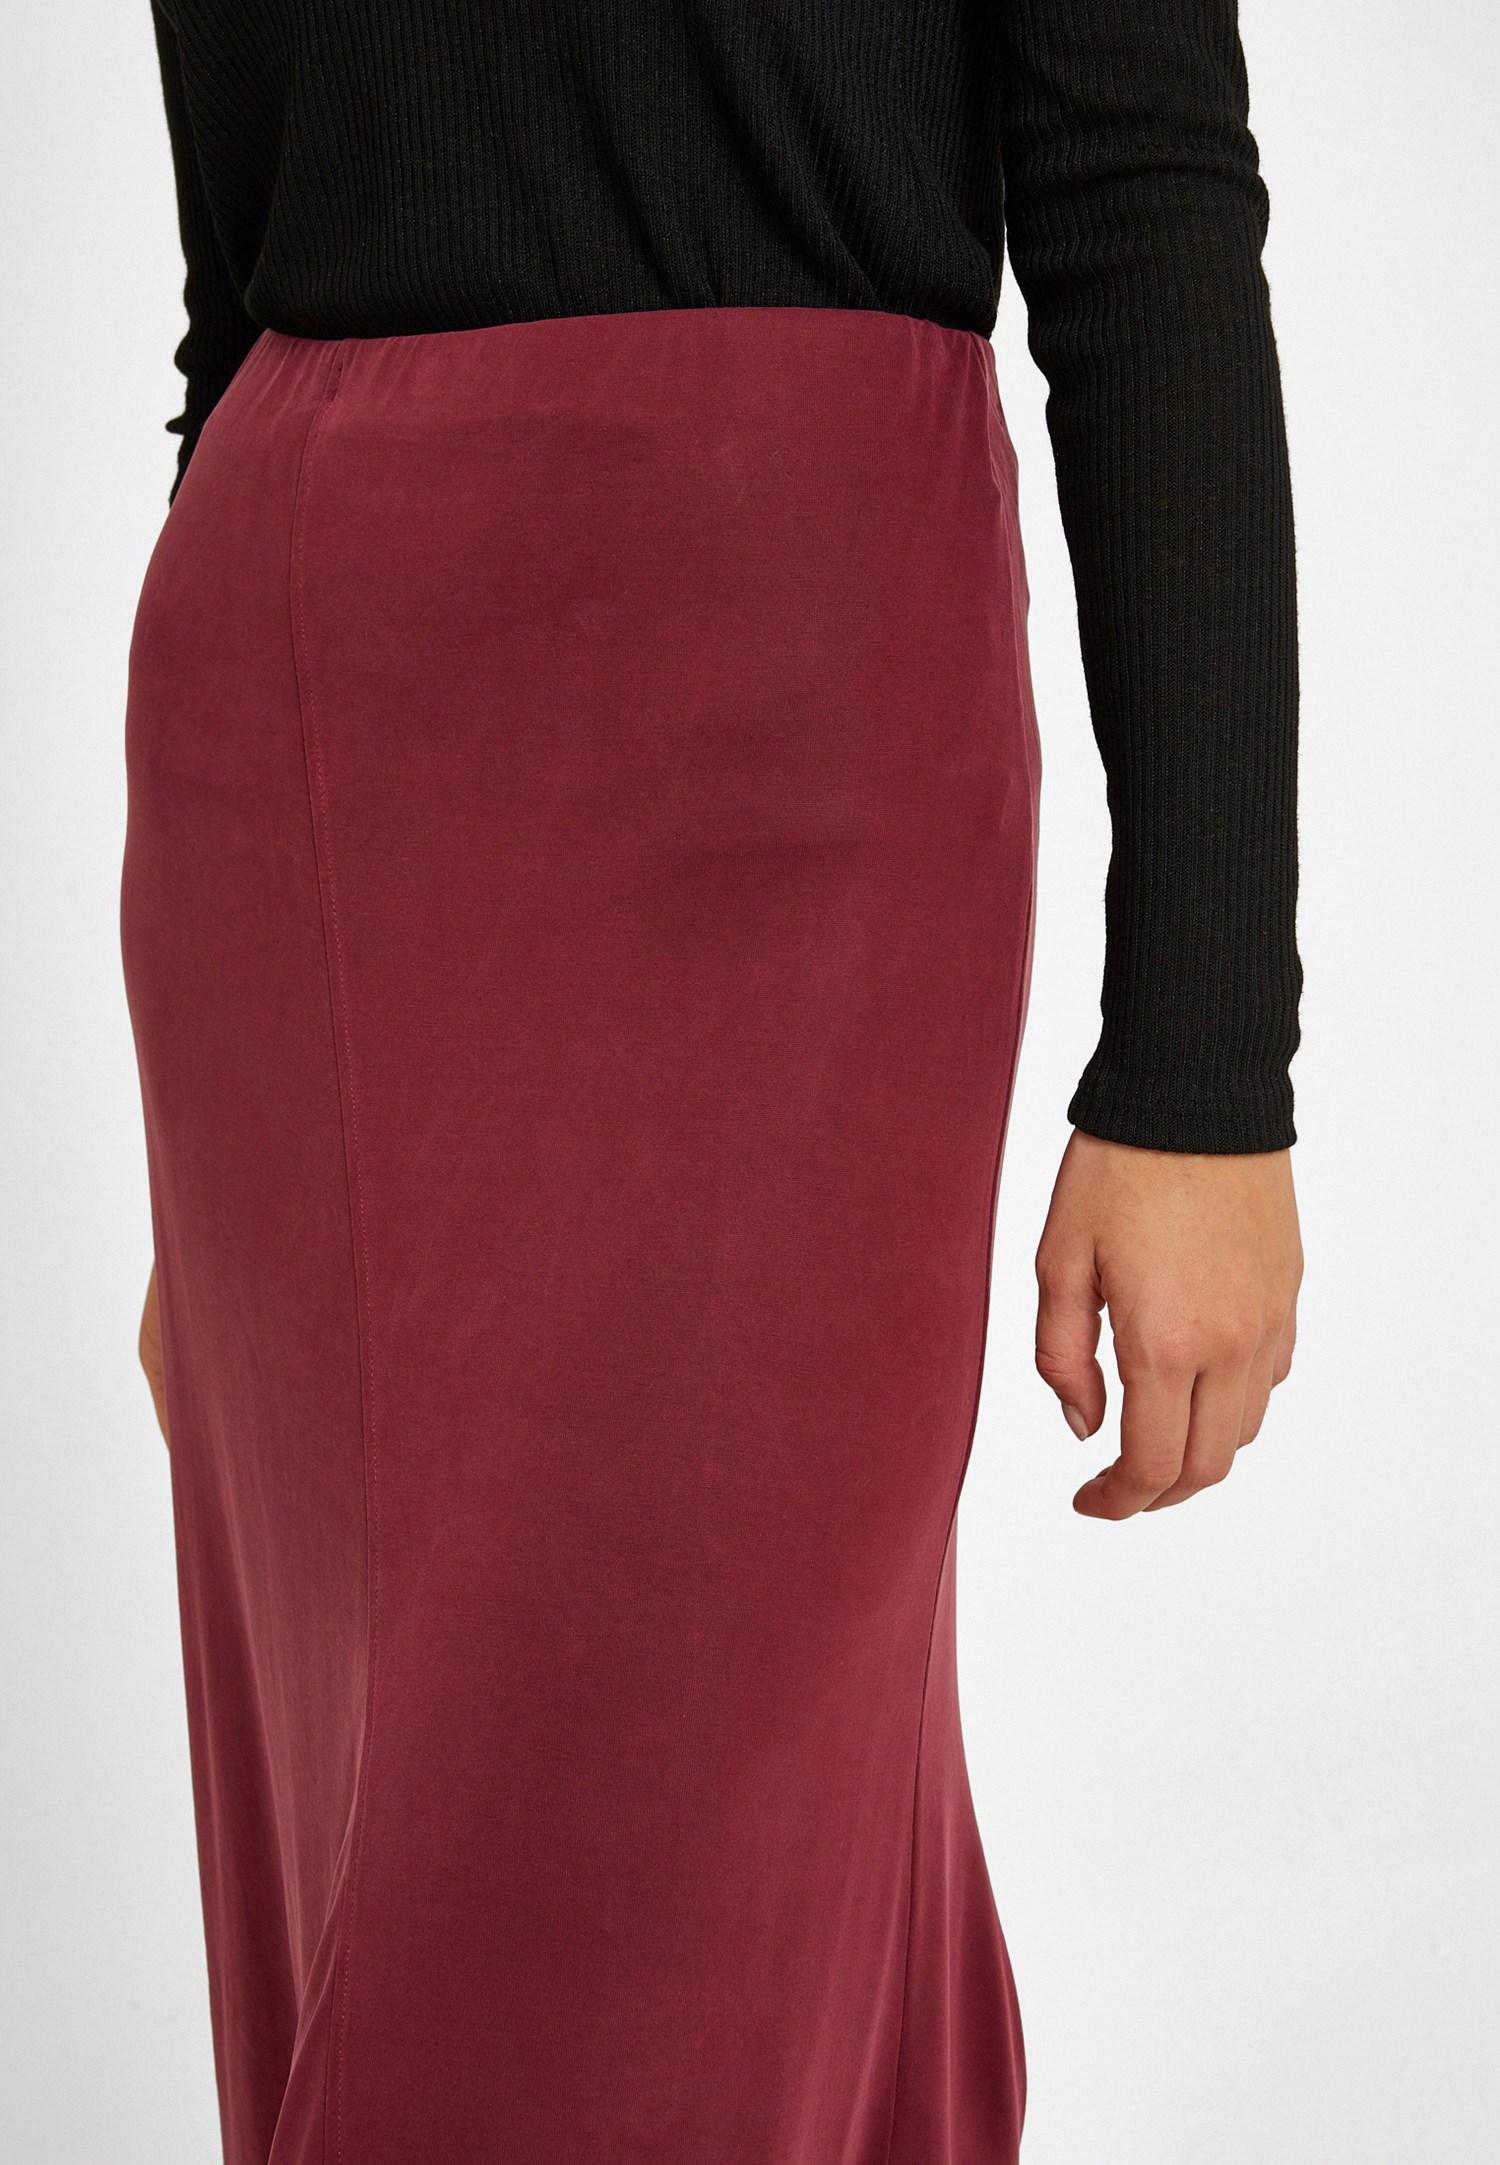 Women Bordeaux Asymmetric Skirt with Detail